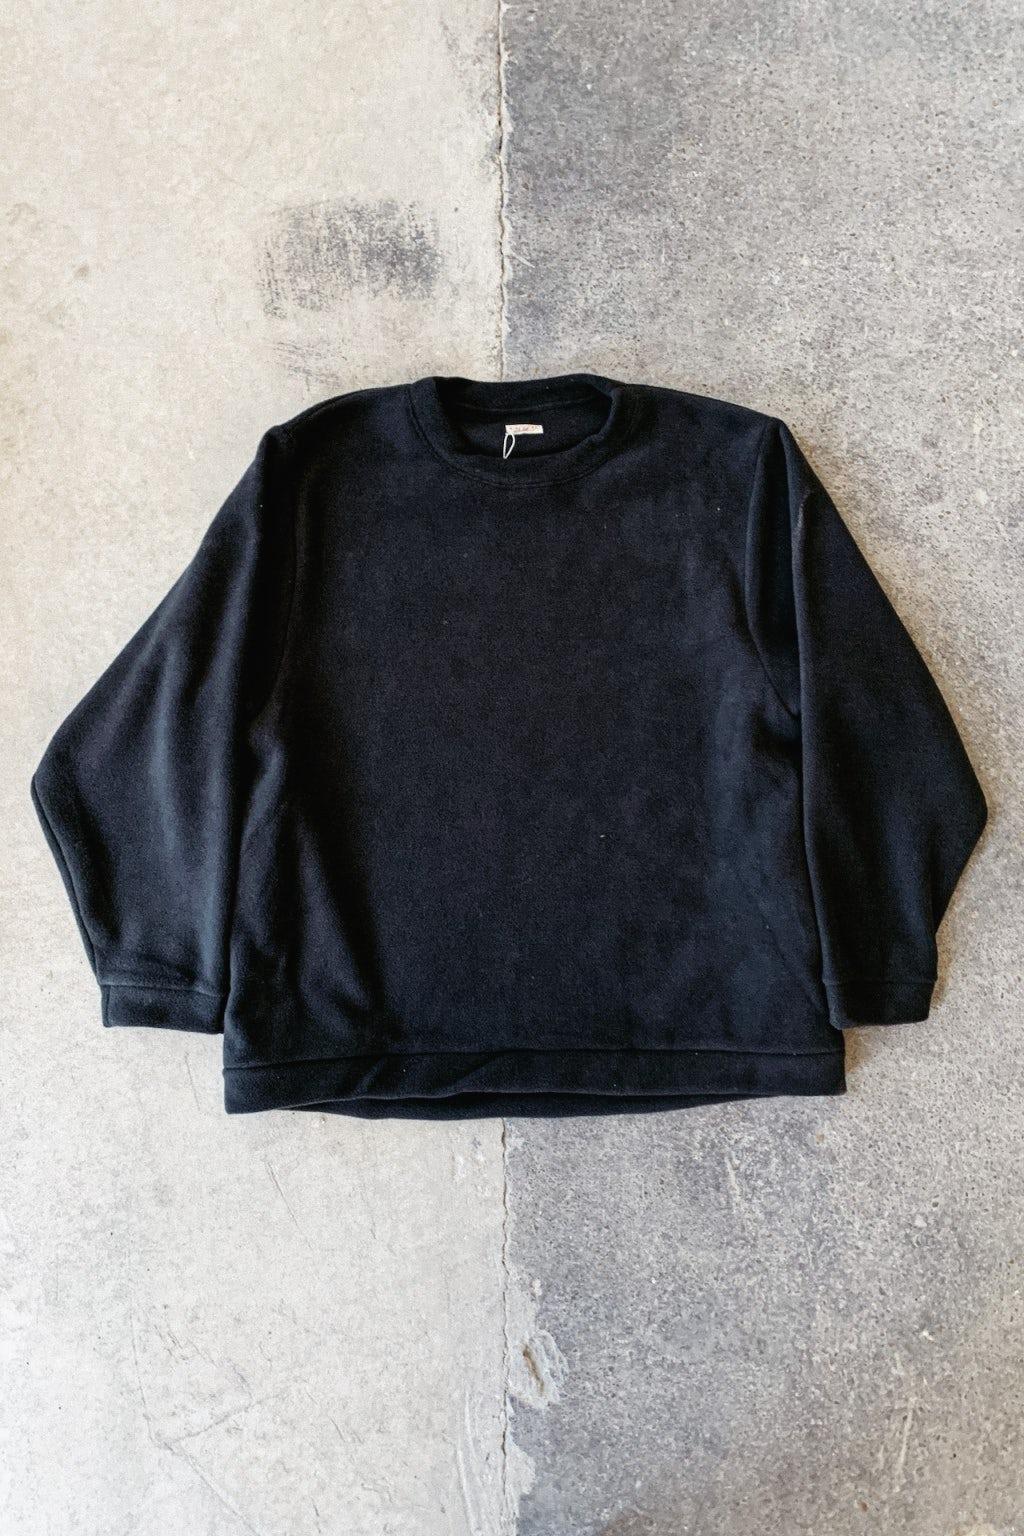 Kapital Reverse Fleece BIG SWT Black